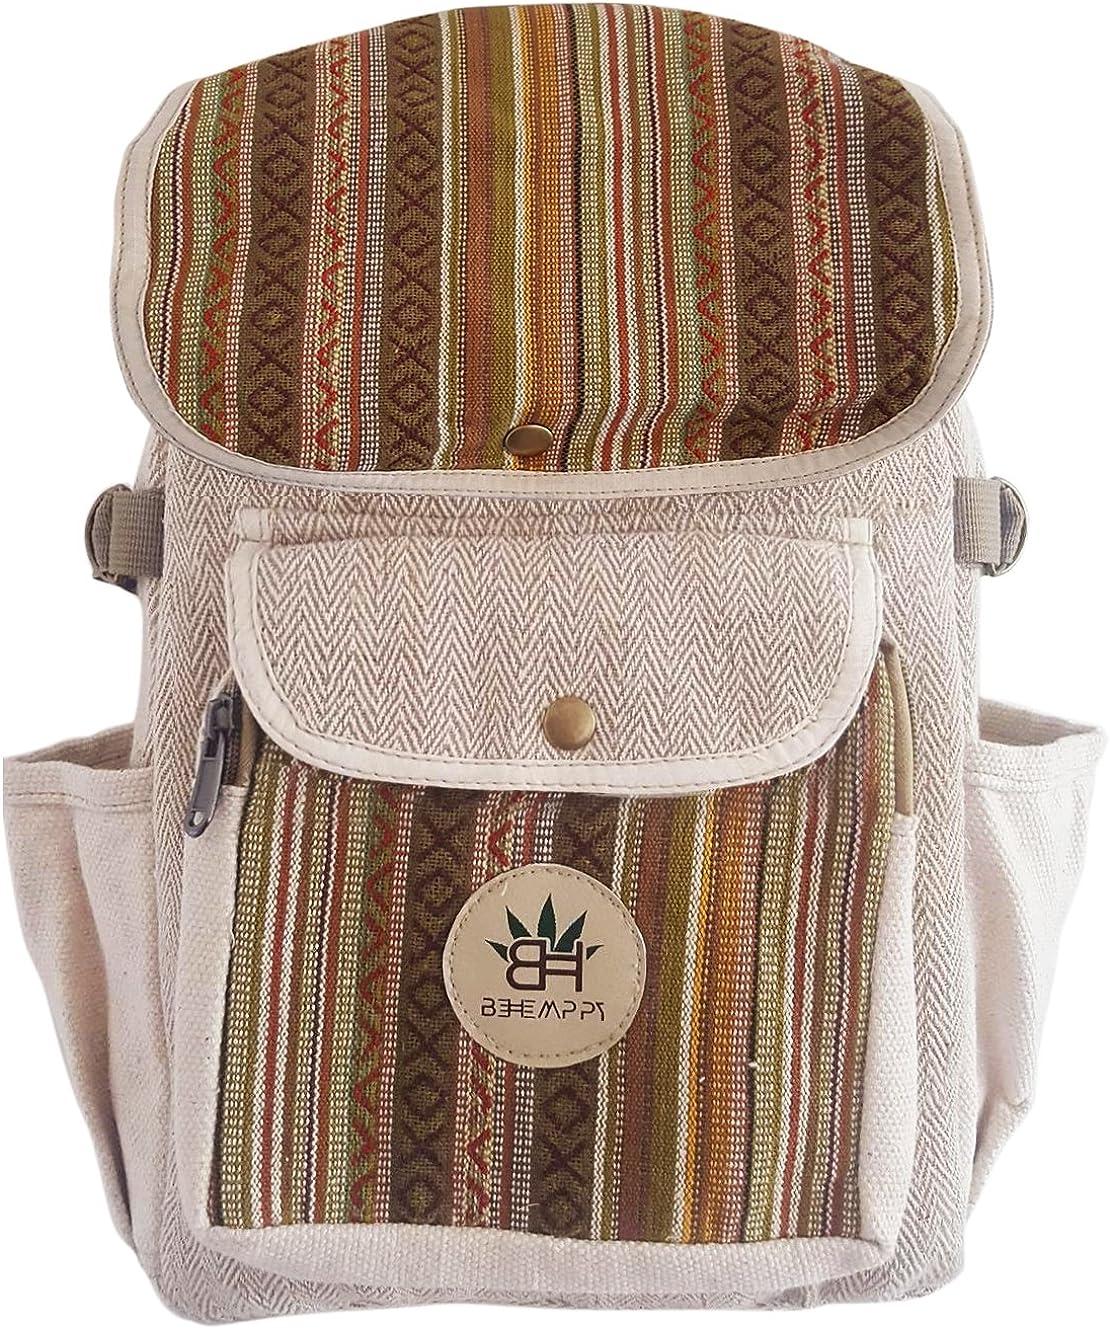 Pure Hemp Rasta Stripe Handmade Himlayan Backpack with Laptop Sleeve - Fashion Cute Travel School College Shoulder Bag/Bookbags/Daypack/Unisex Backpack